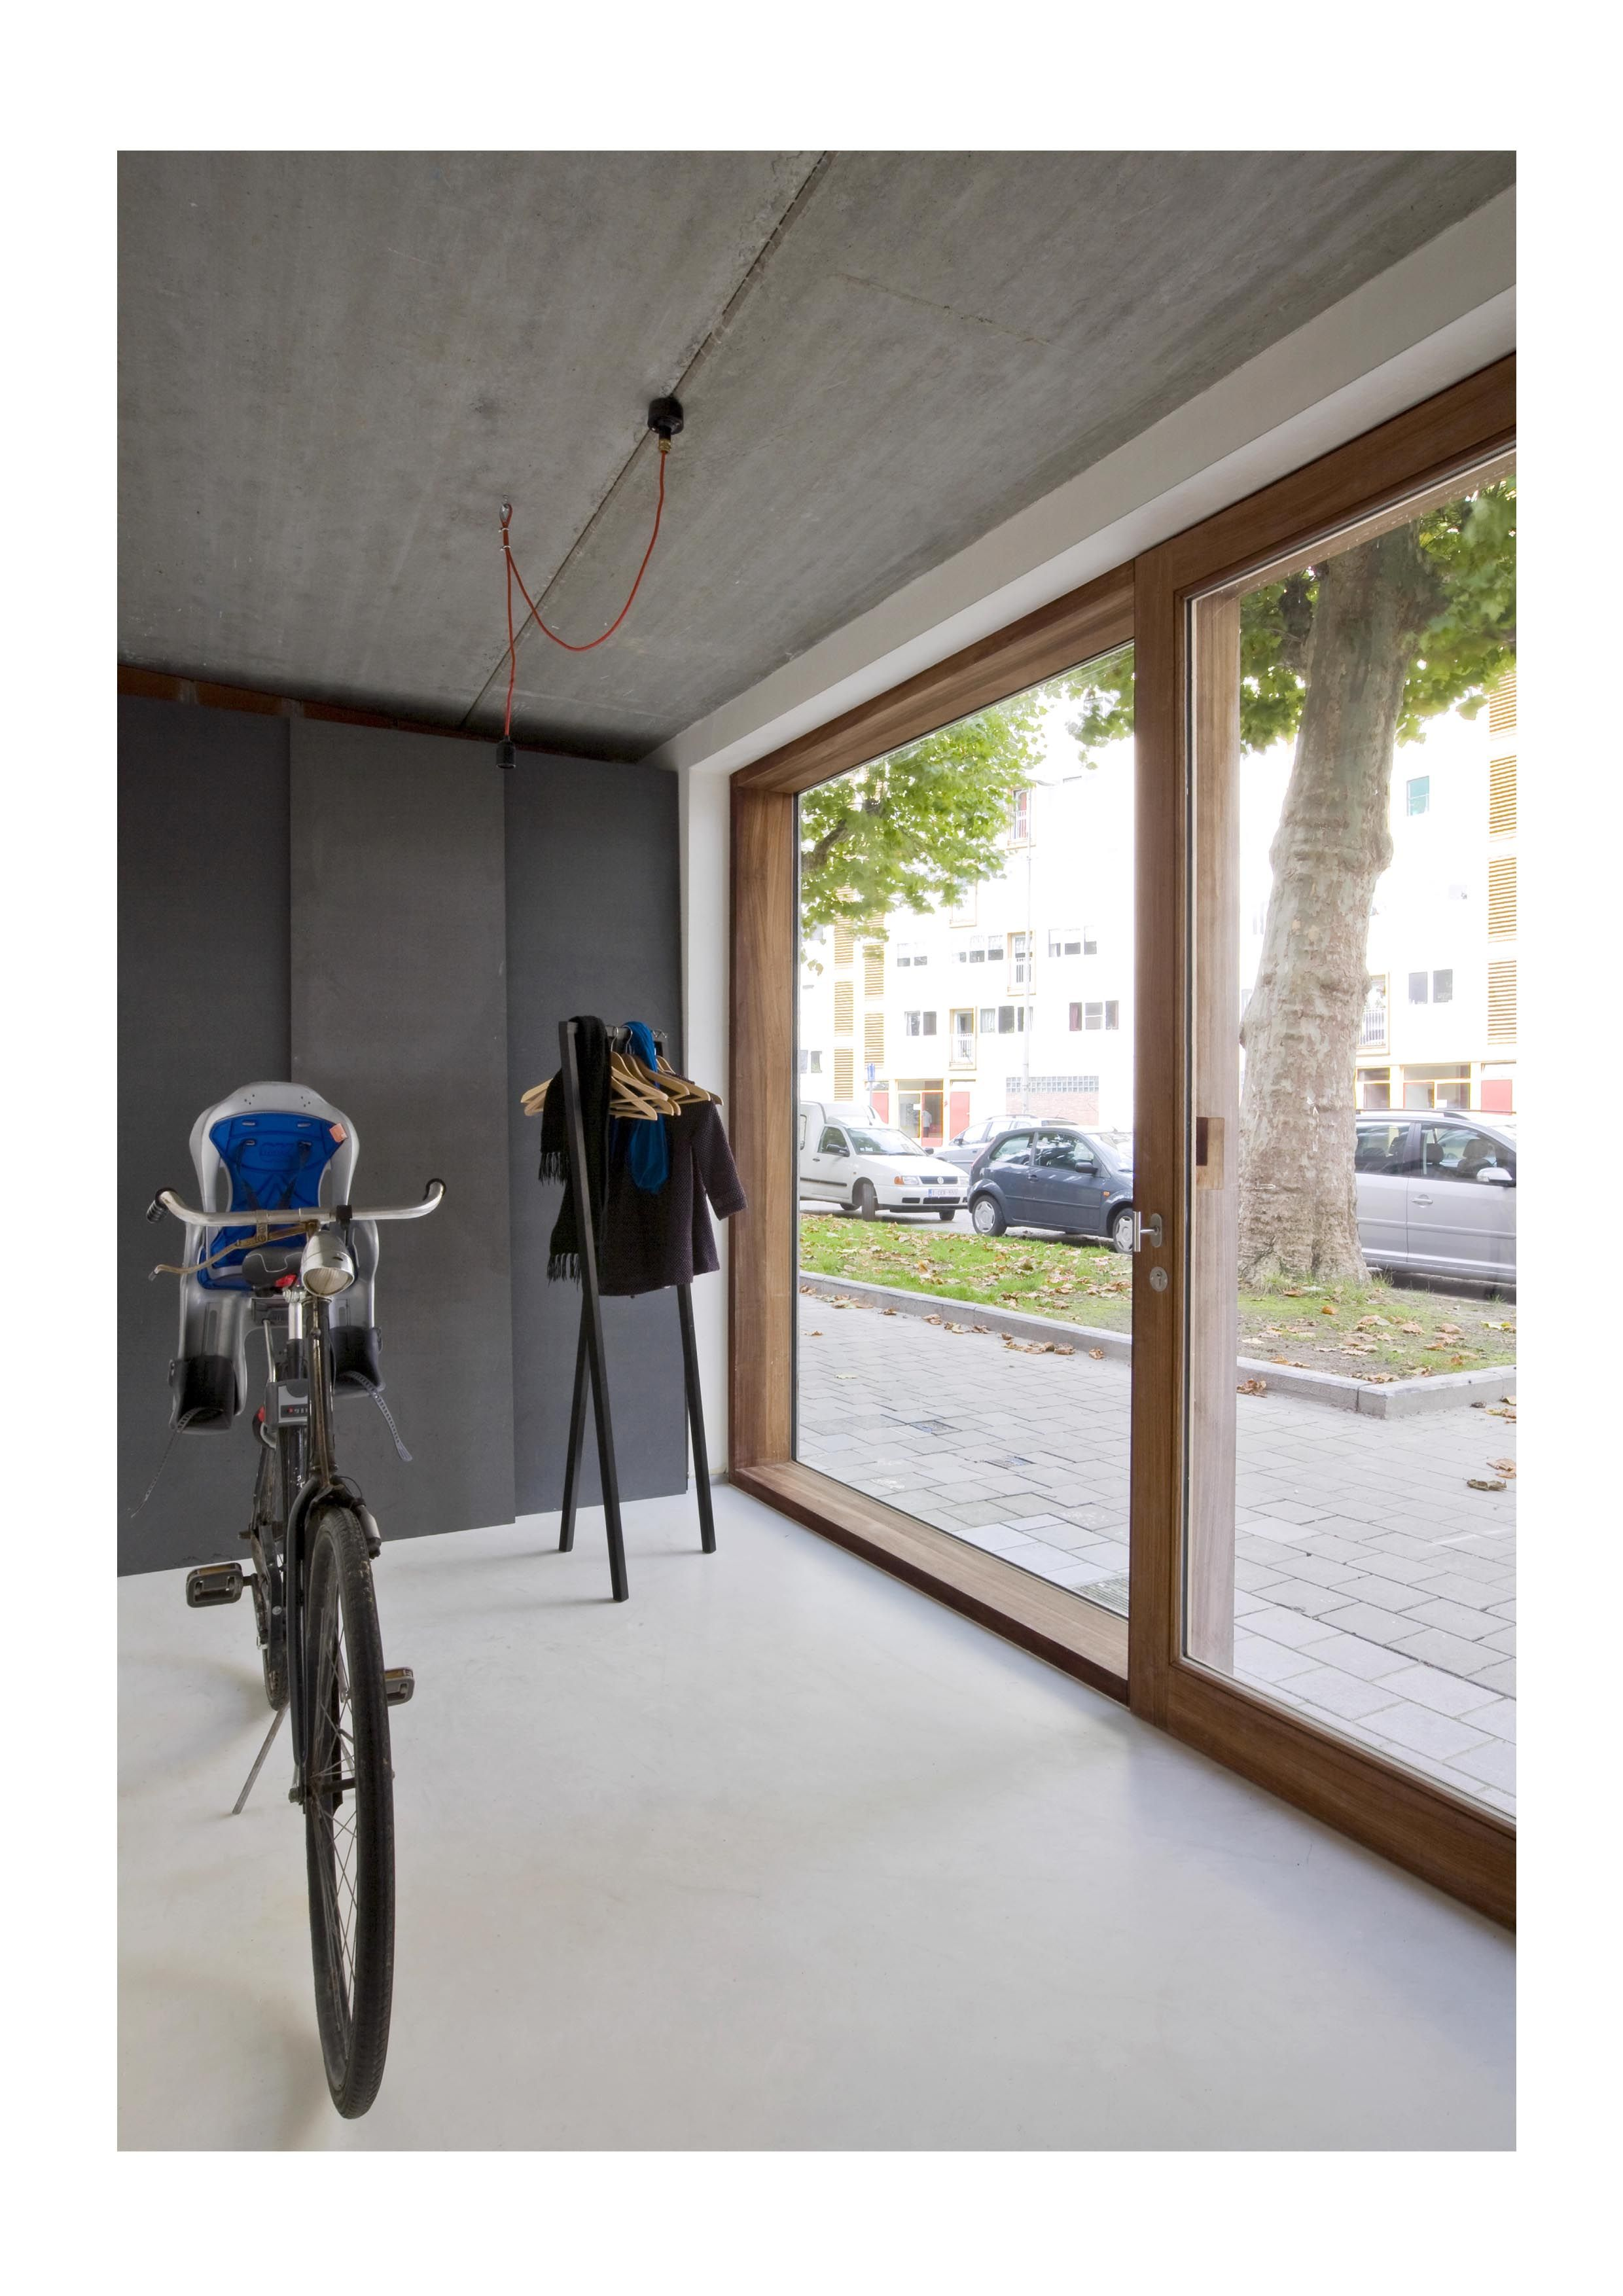 House wooden window design  fotog  vanbinnen  pinterest  plywood design wooden